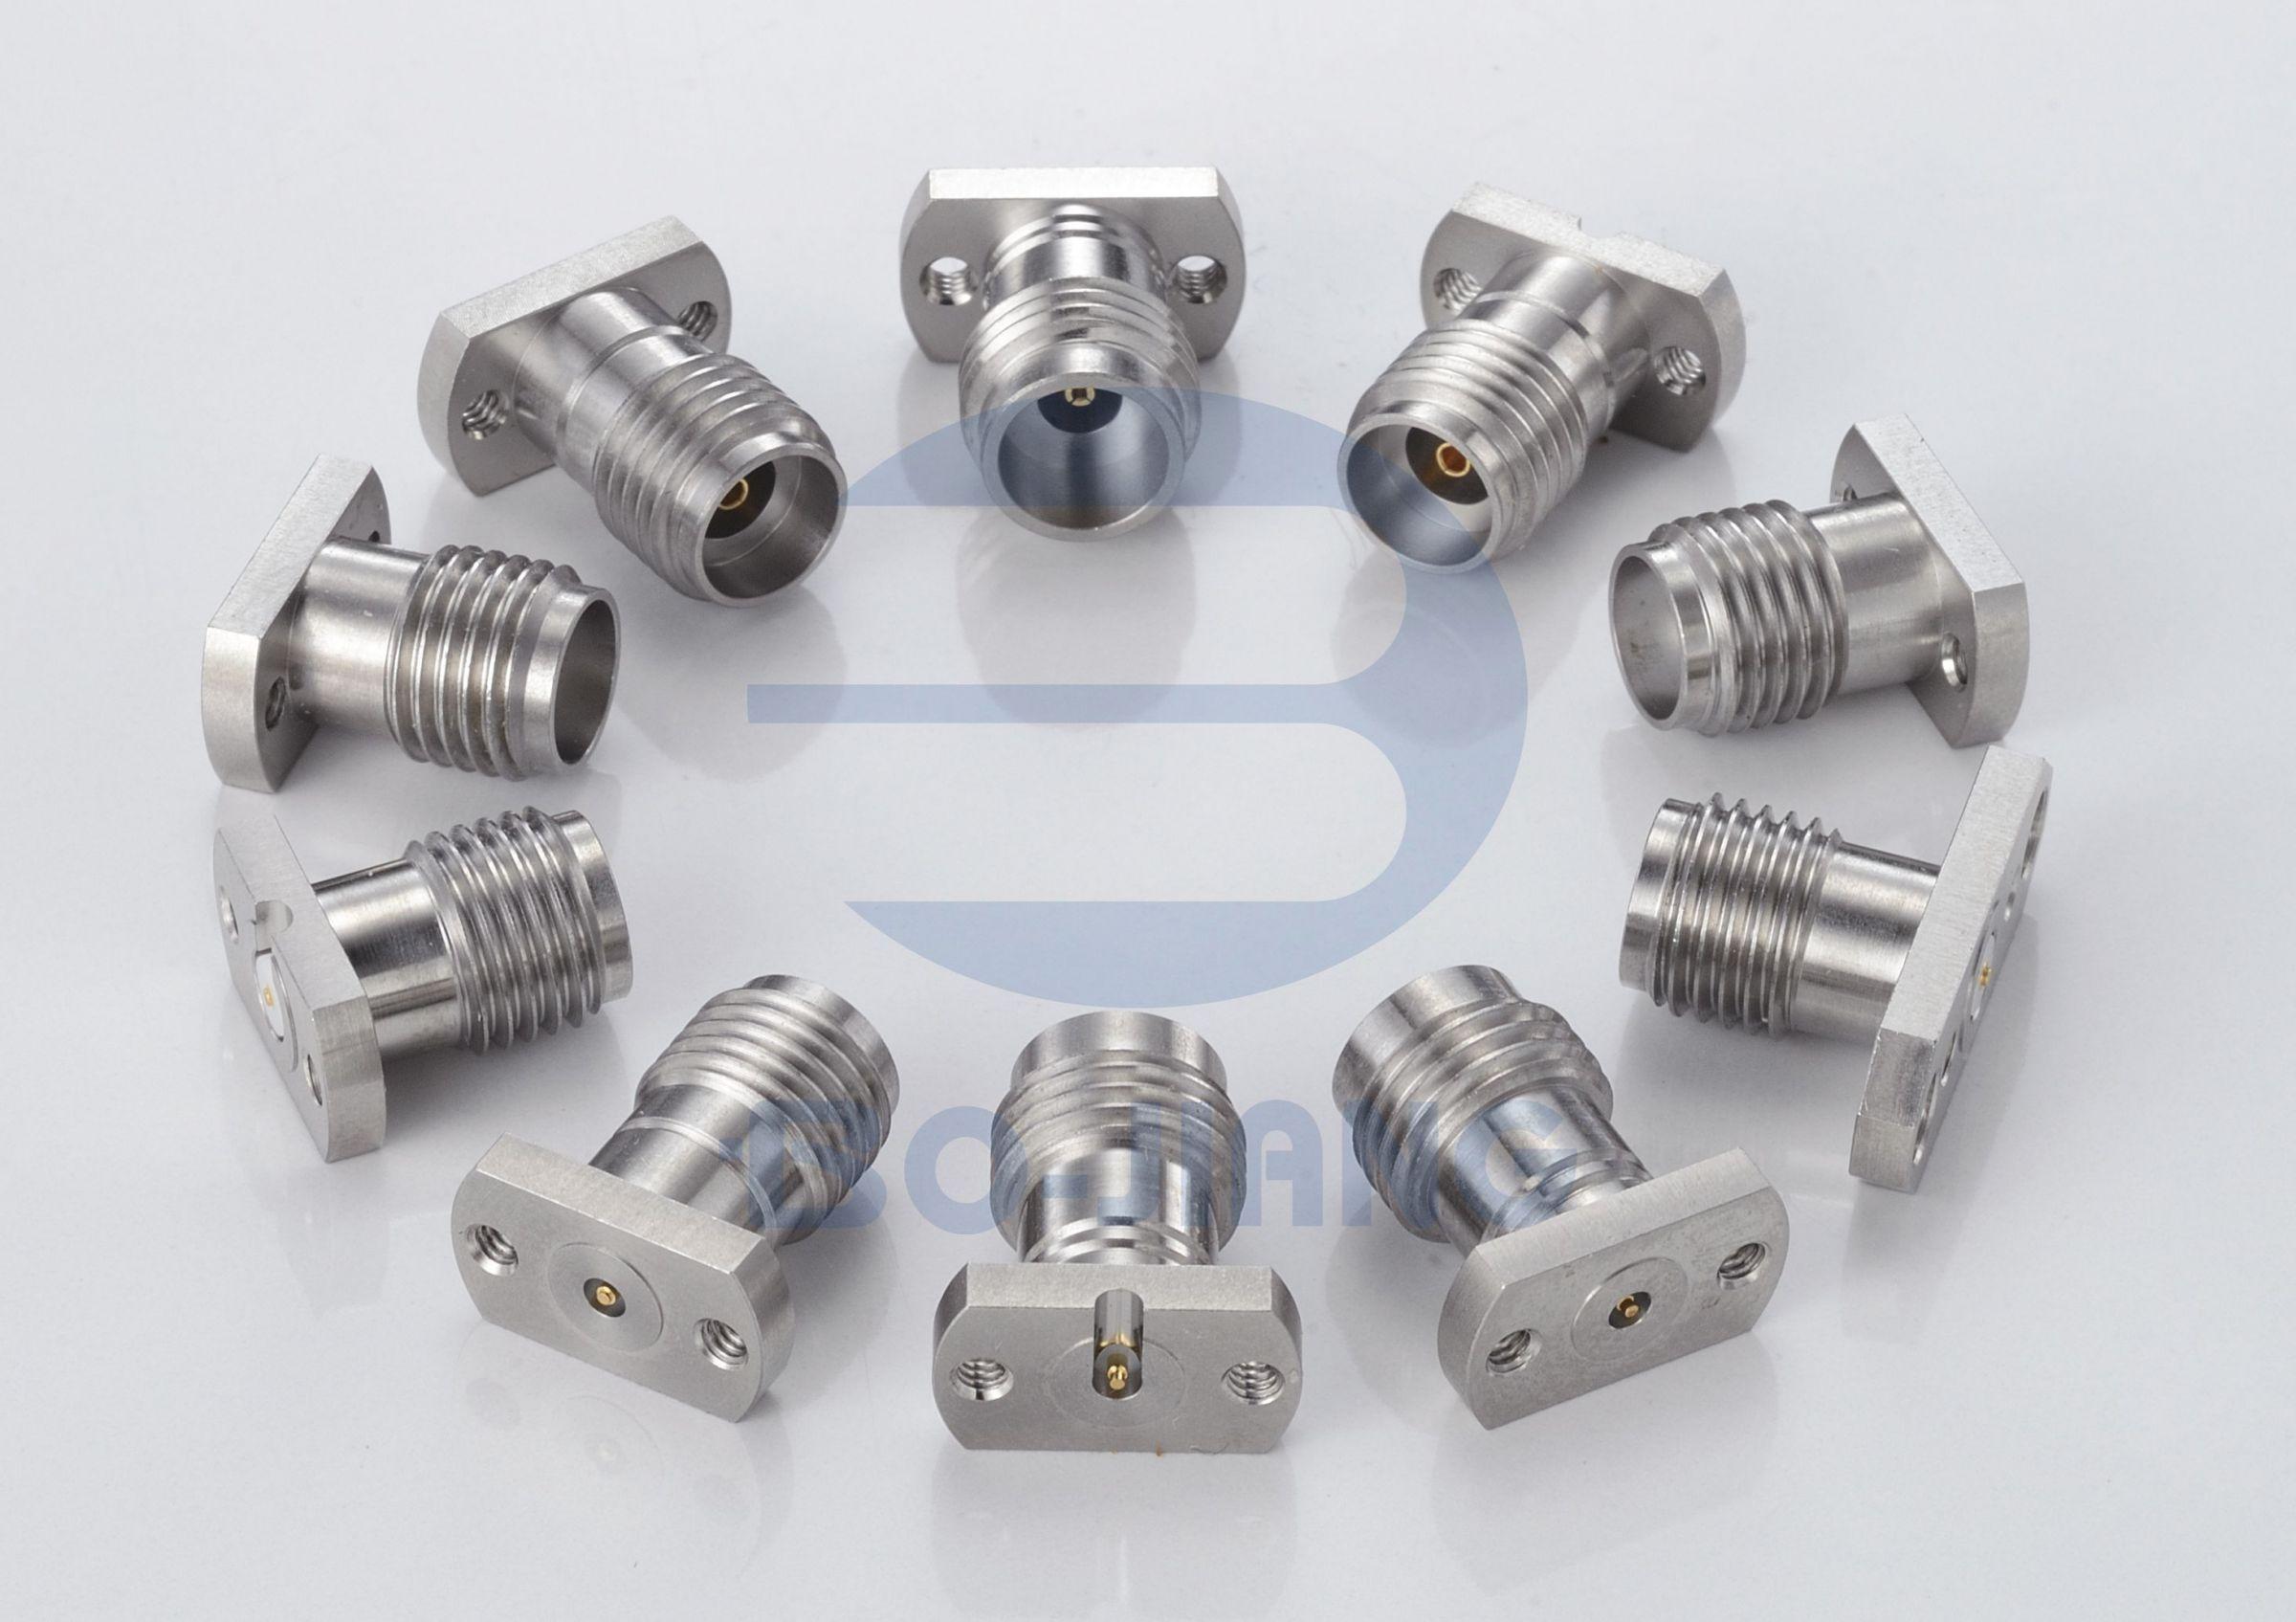 Solderless PCB Mount Connectors